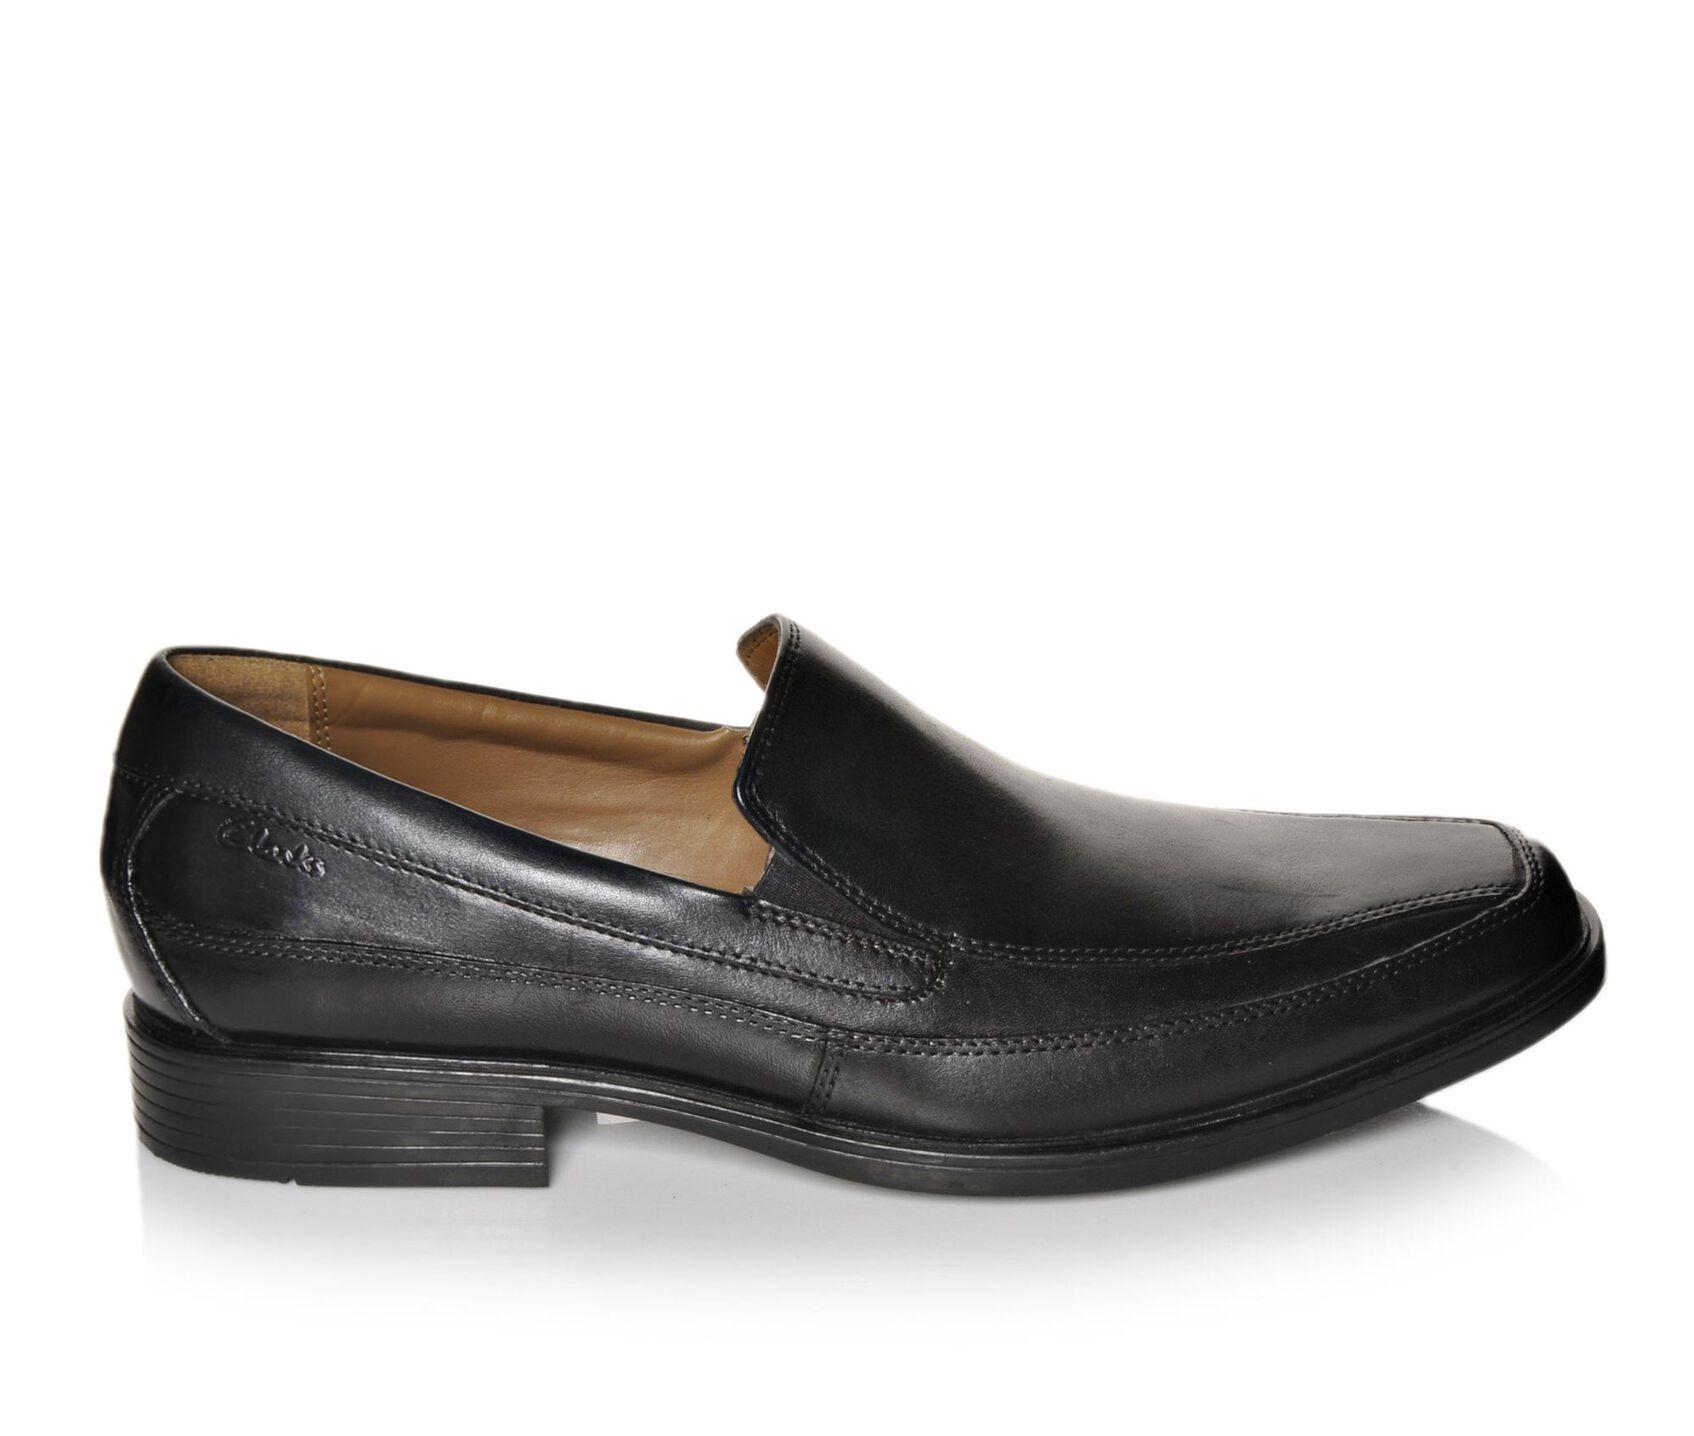 cc971fe24b Men's Clarks Tilden Free Dress Shoes